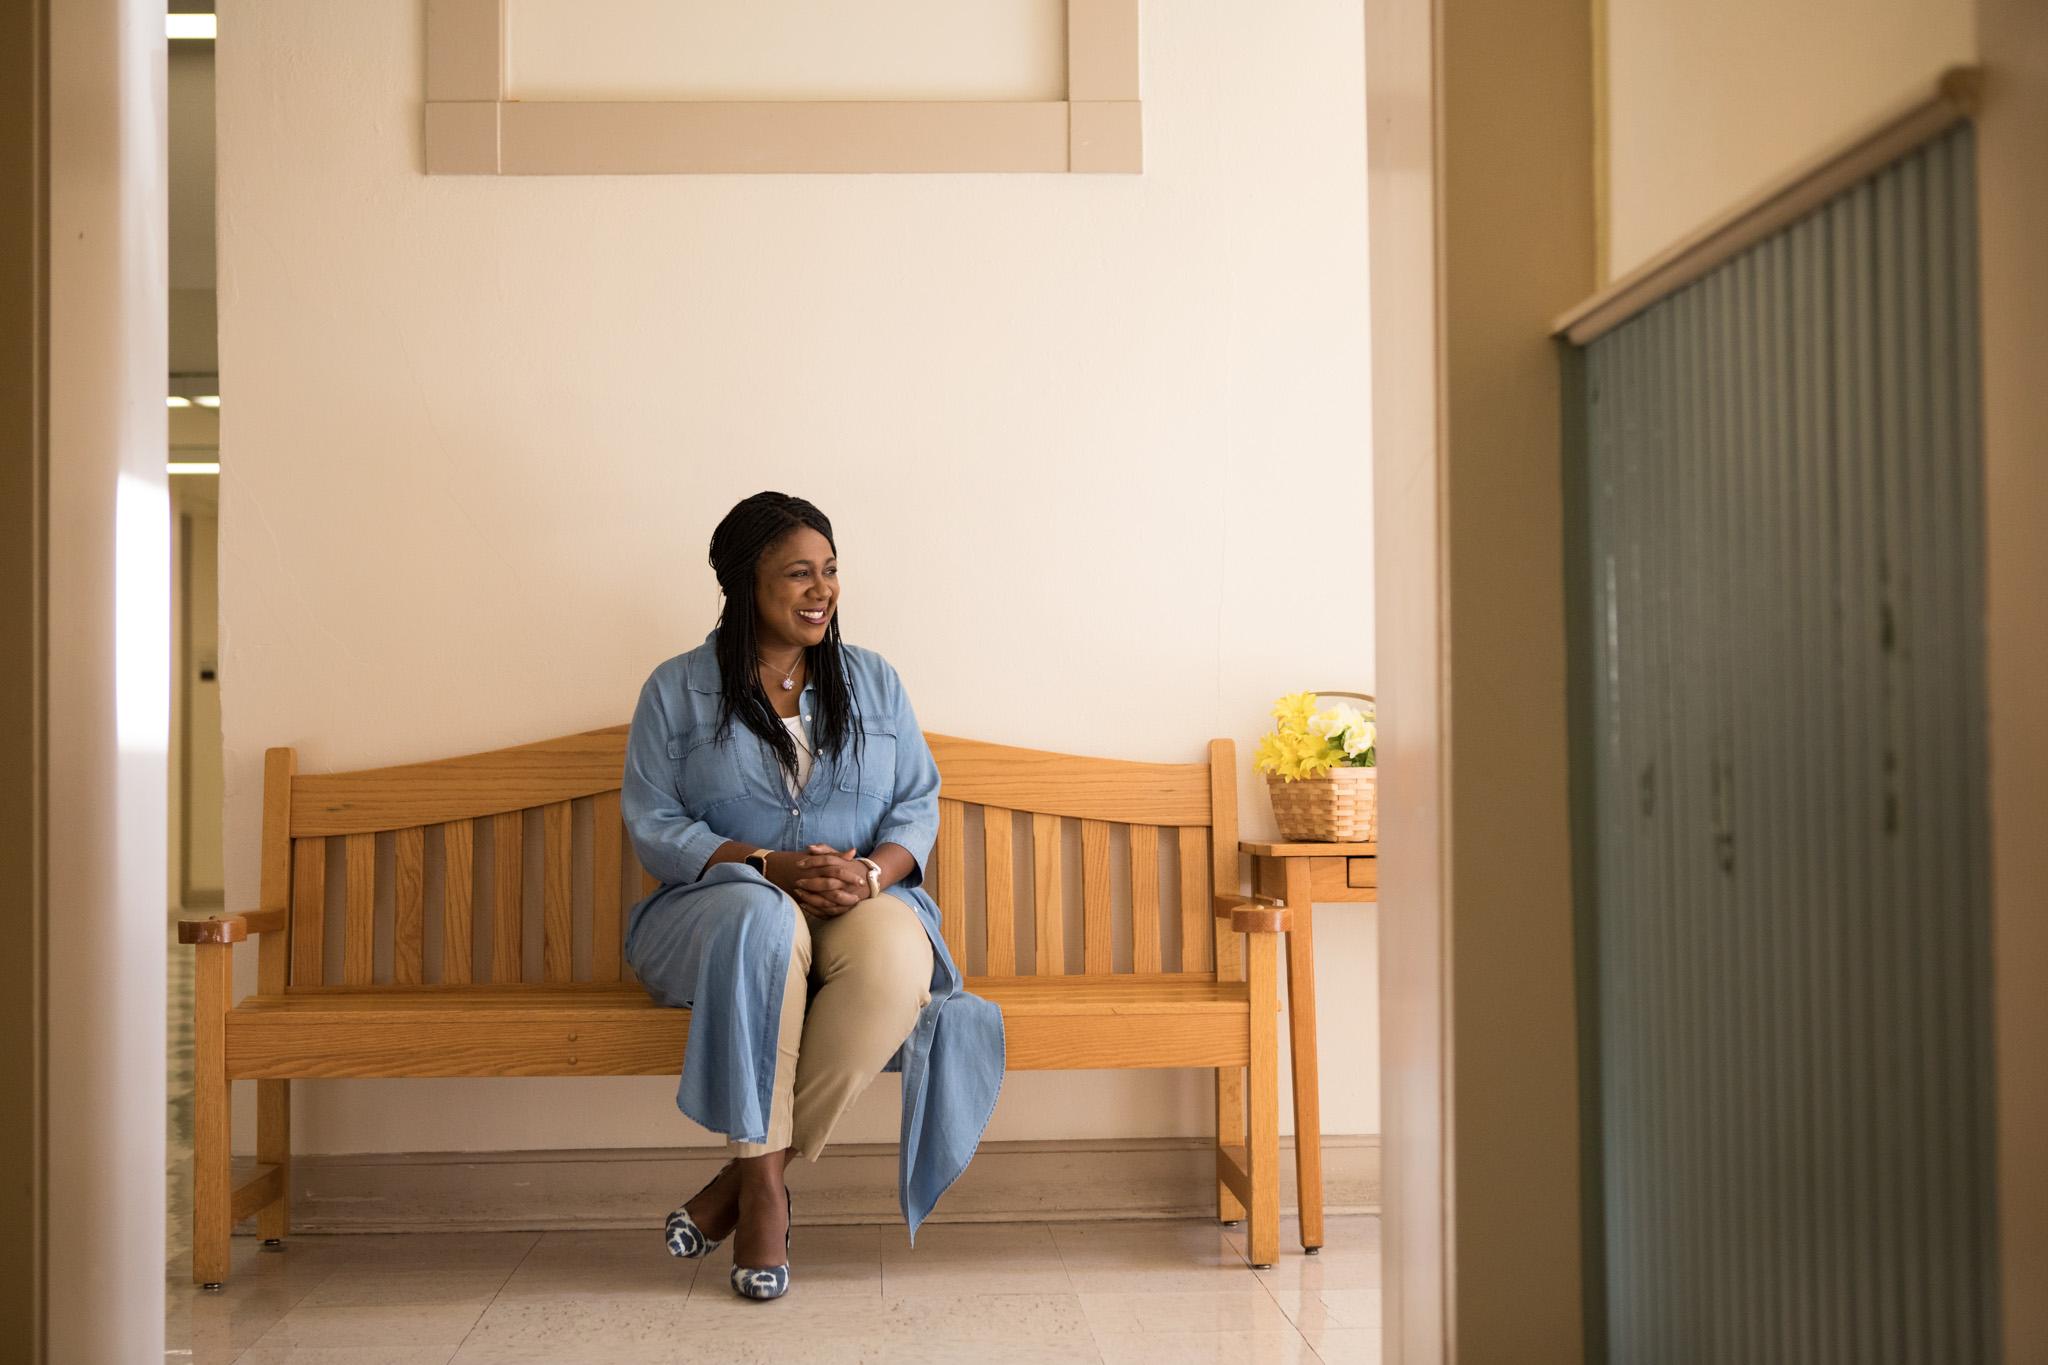 SAISD Chief of Staff Tiffany Grant sits inside the new Pickett Parent Center.